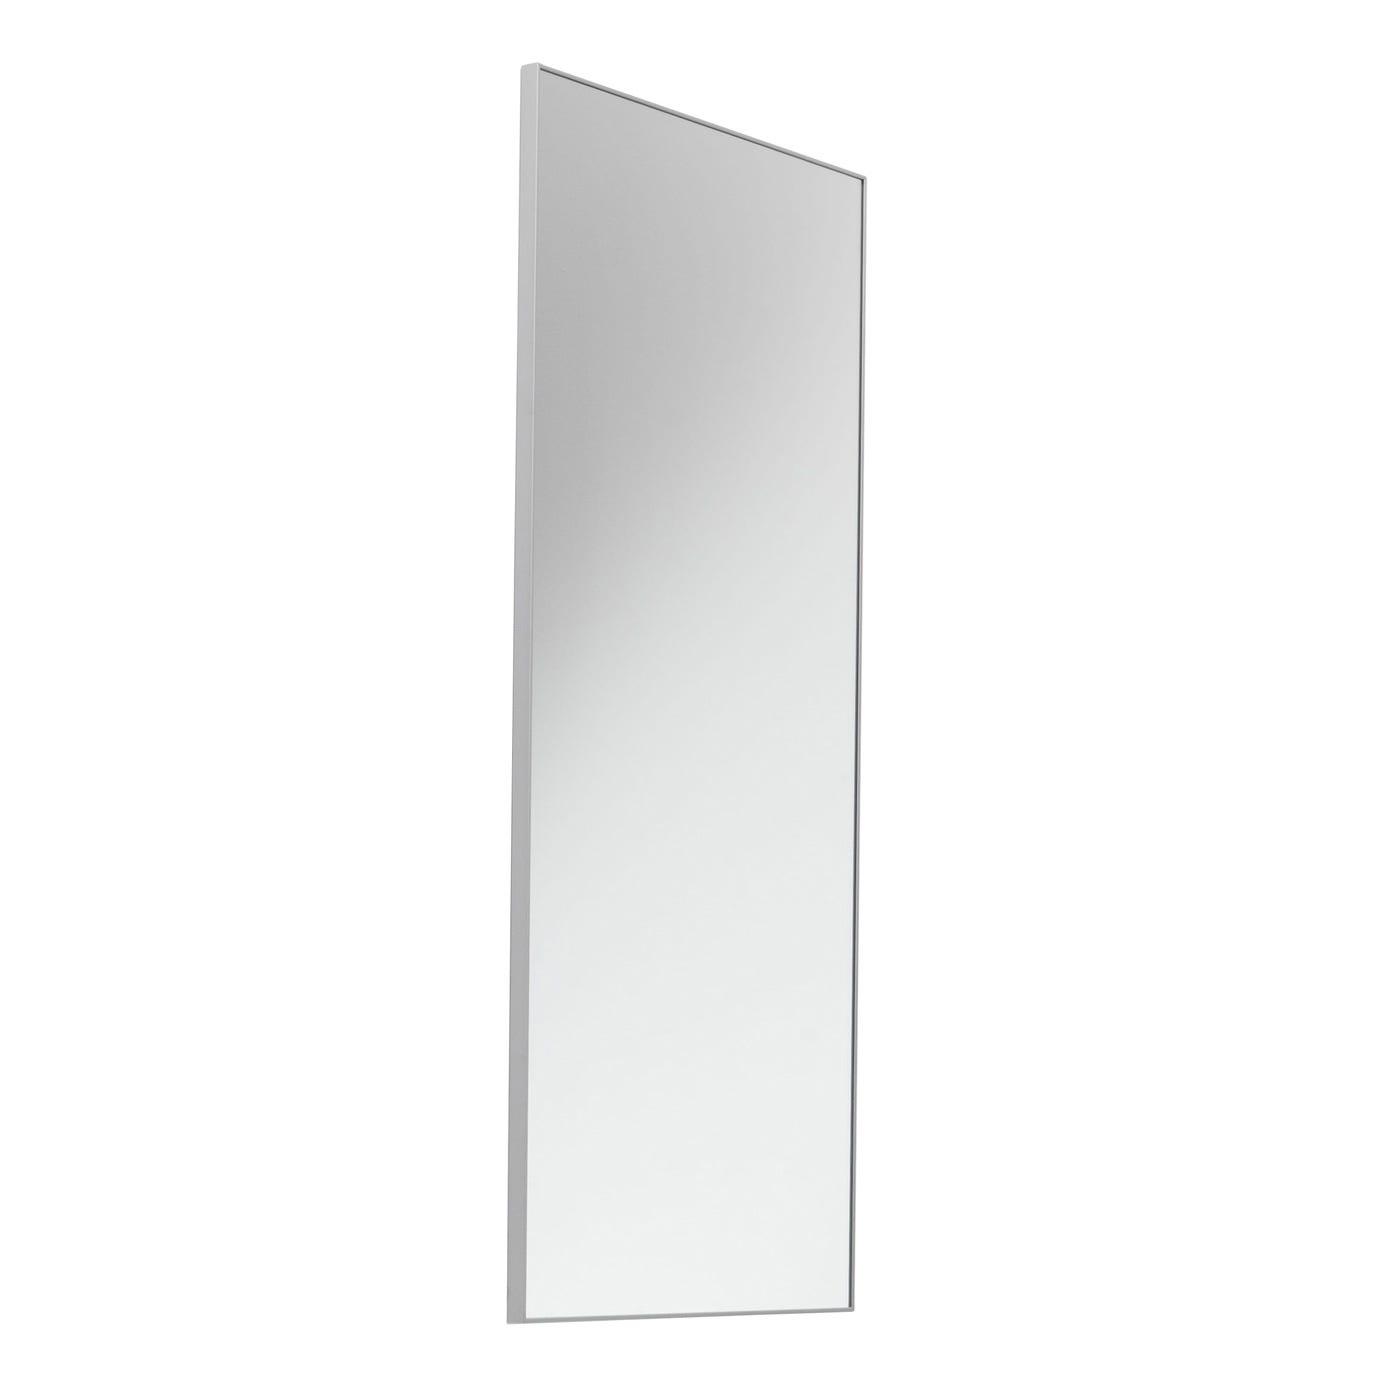 Horm Ute Minimal Mirror